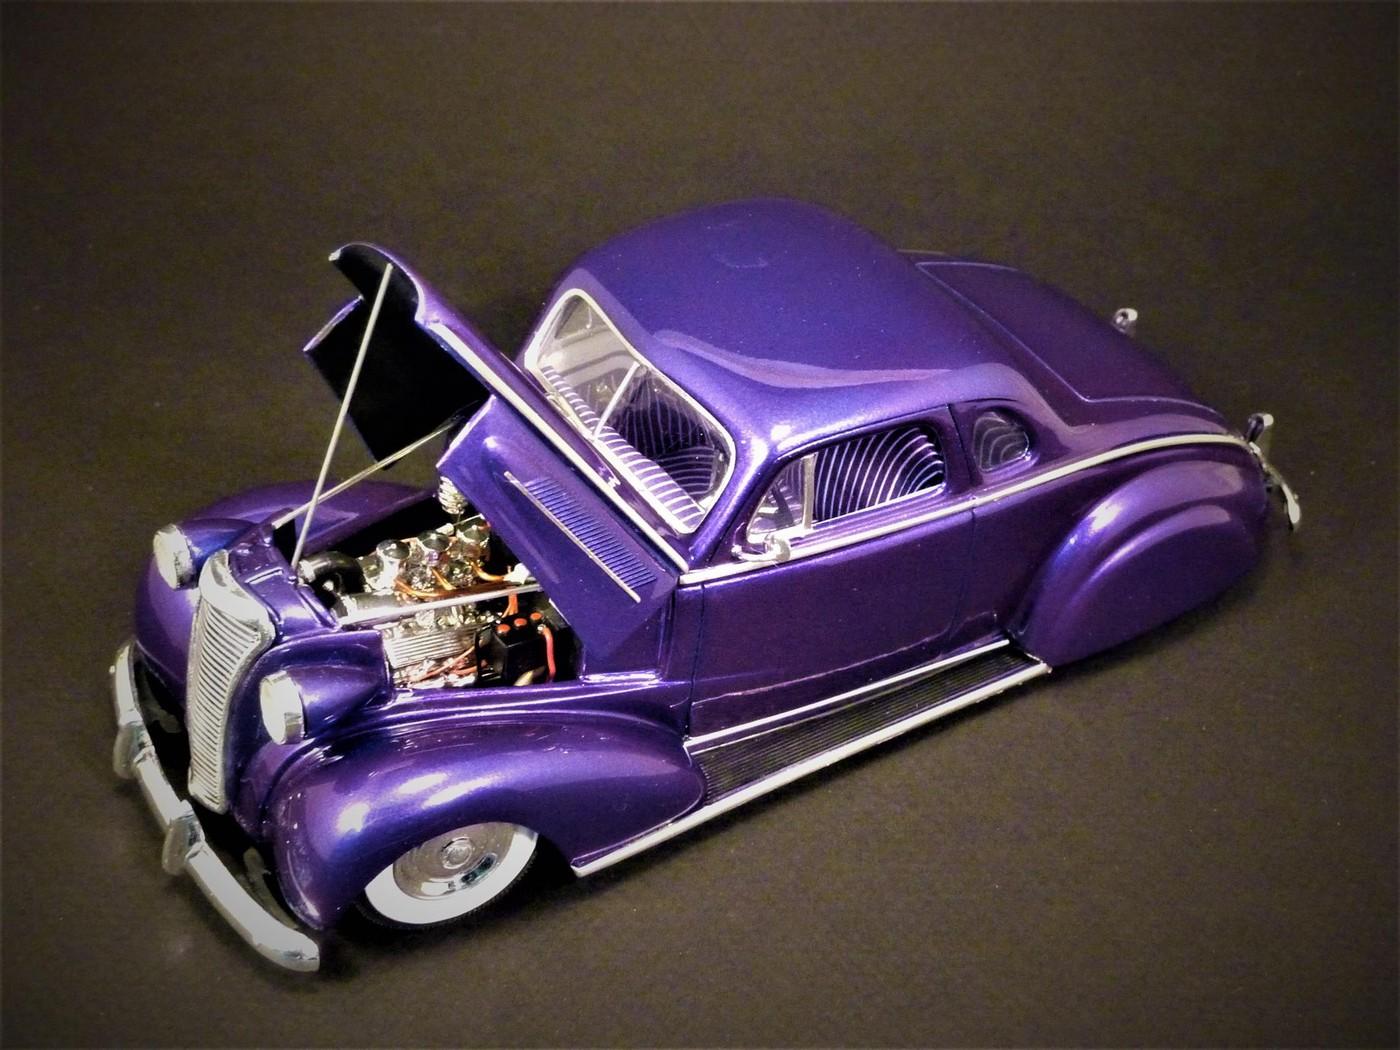 Projet Chevy 37 custom terminée  - Page 2 Photo64-vi